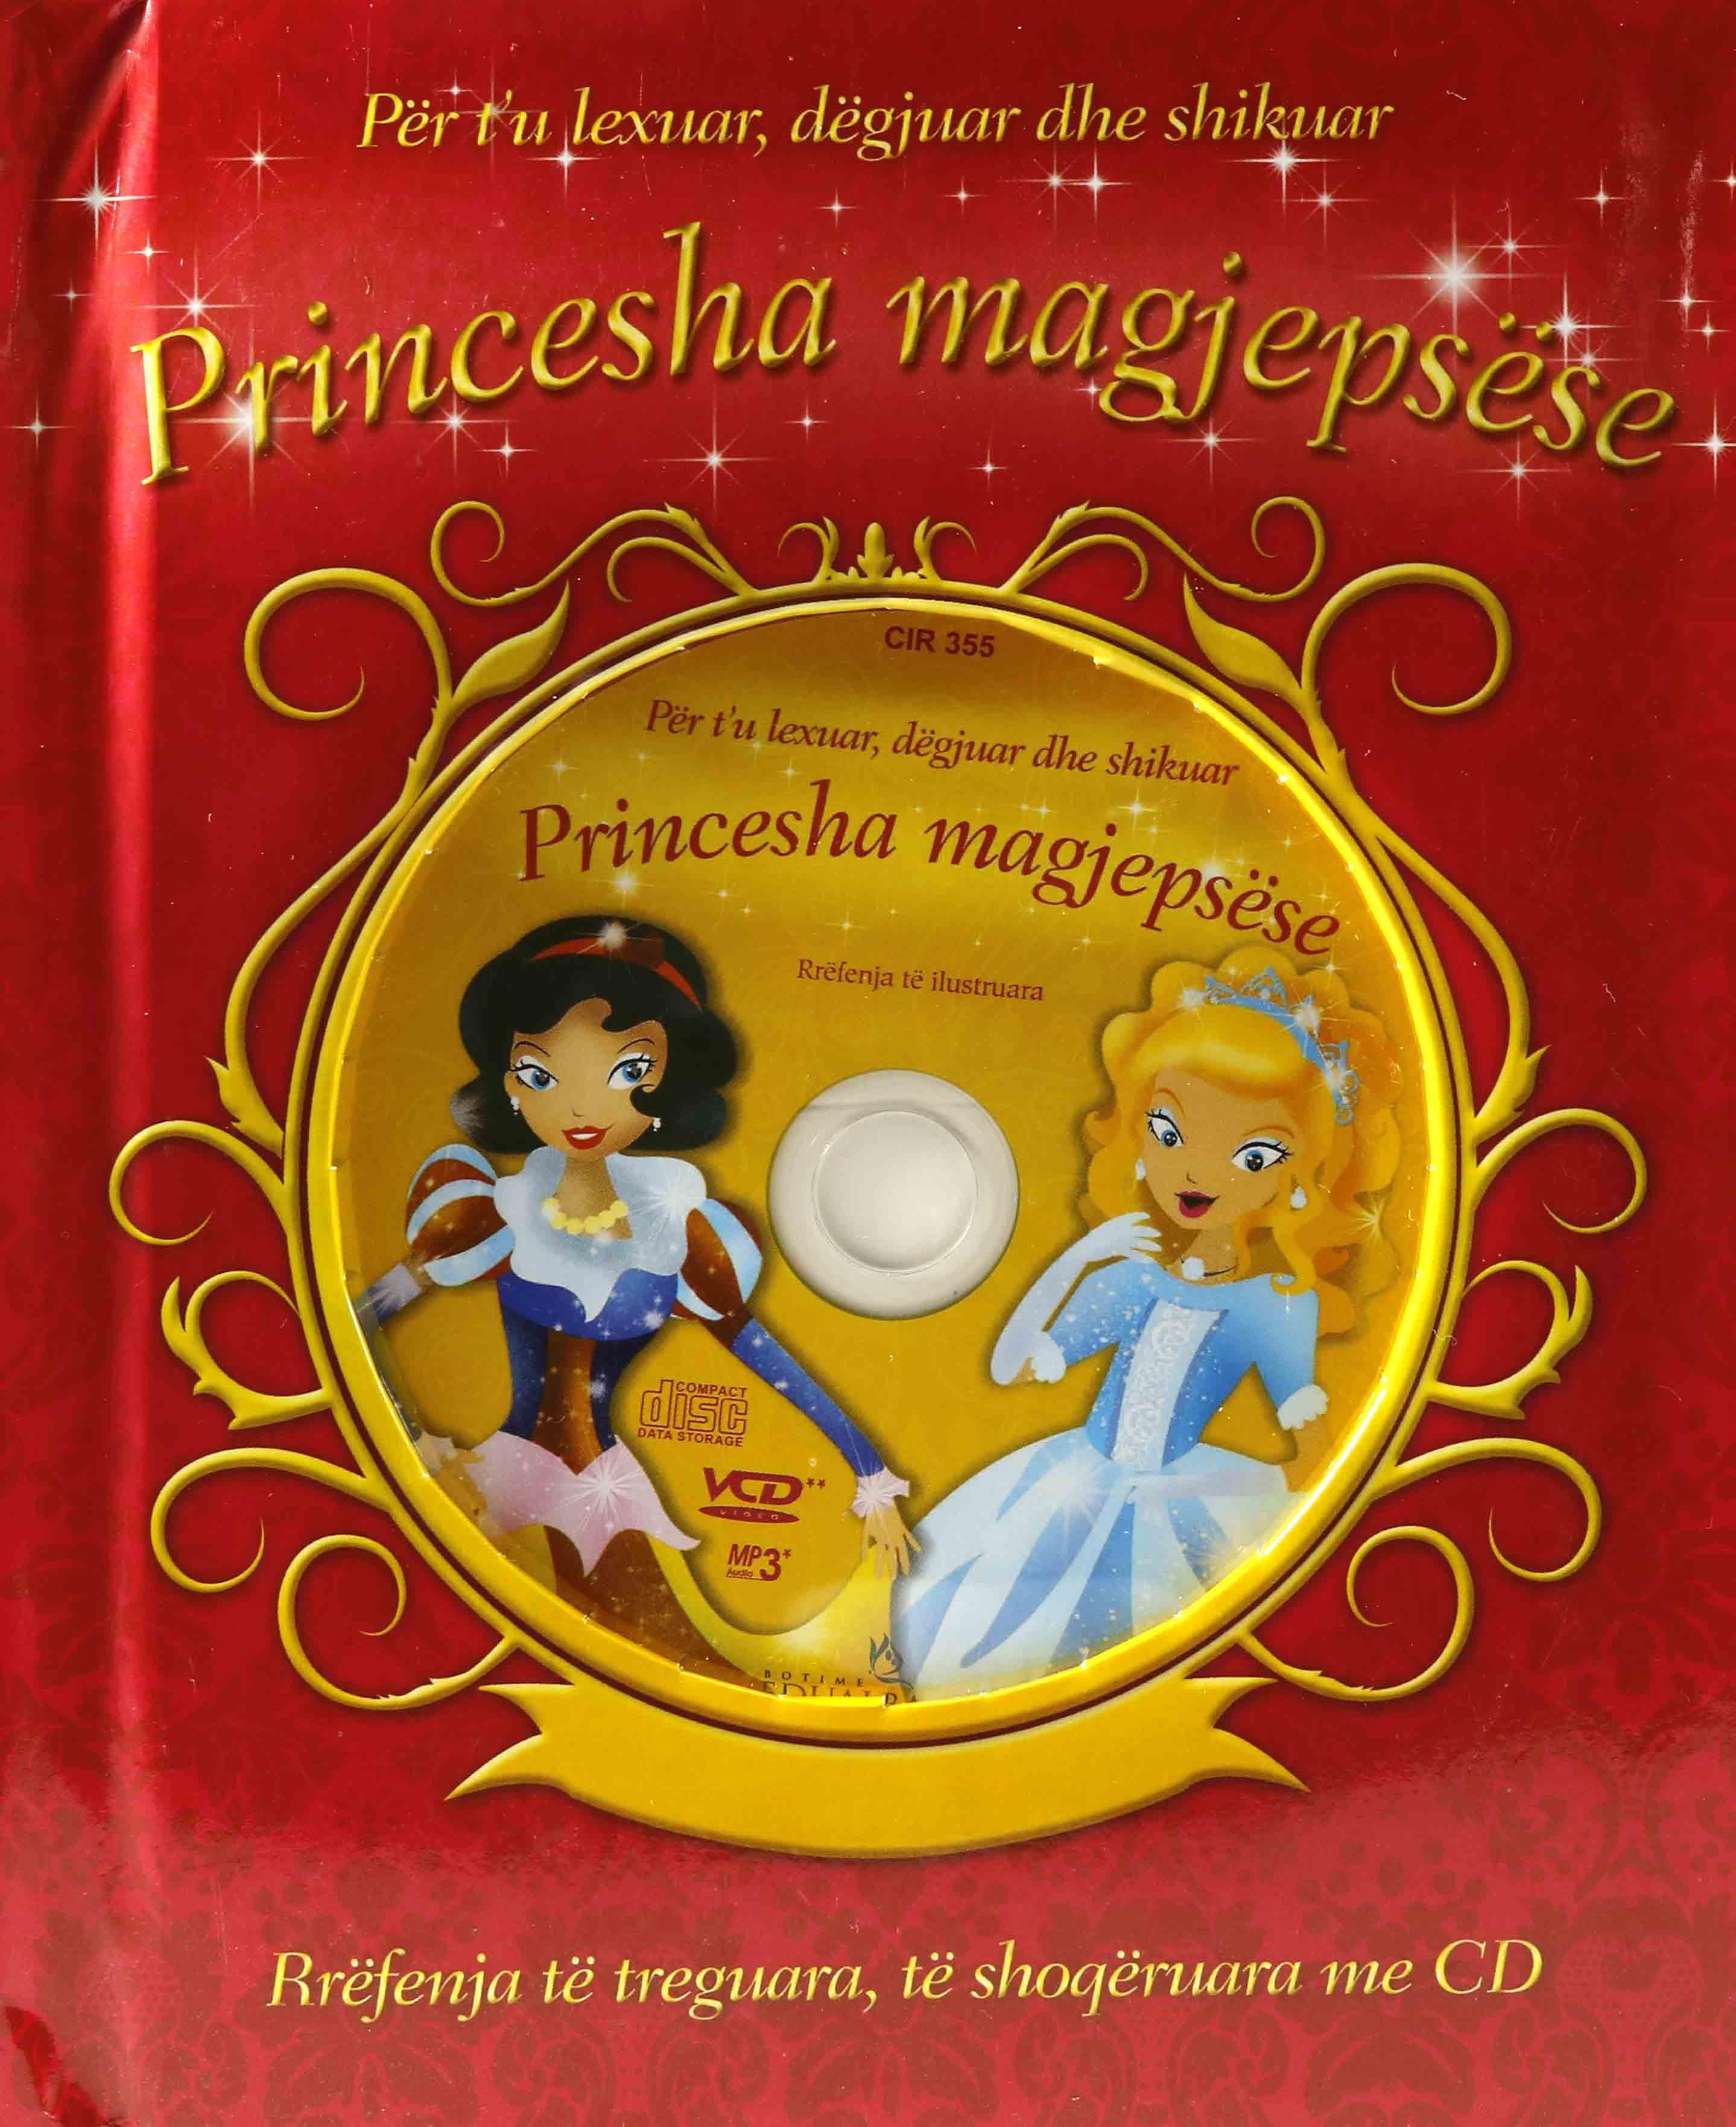 Princesha magjepsëse